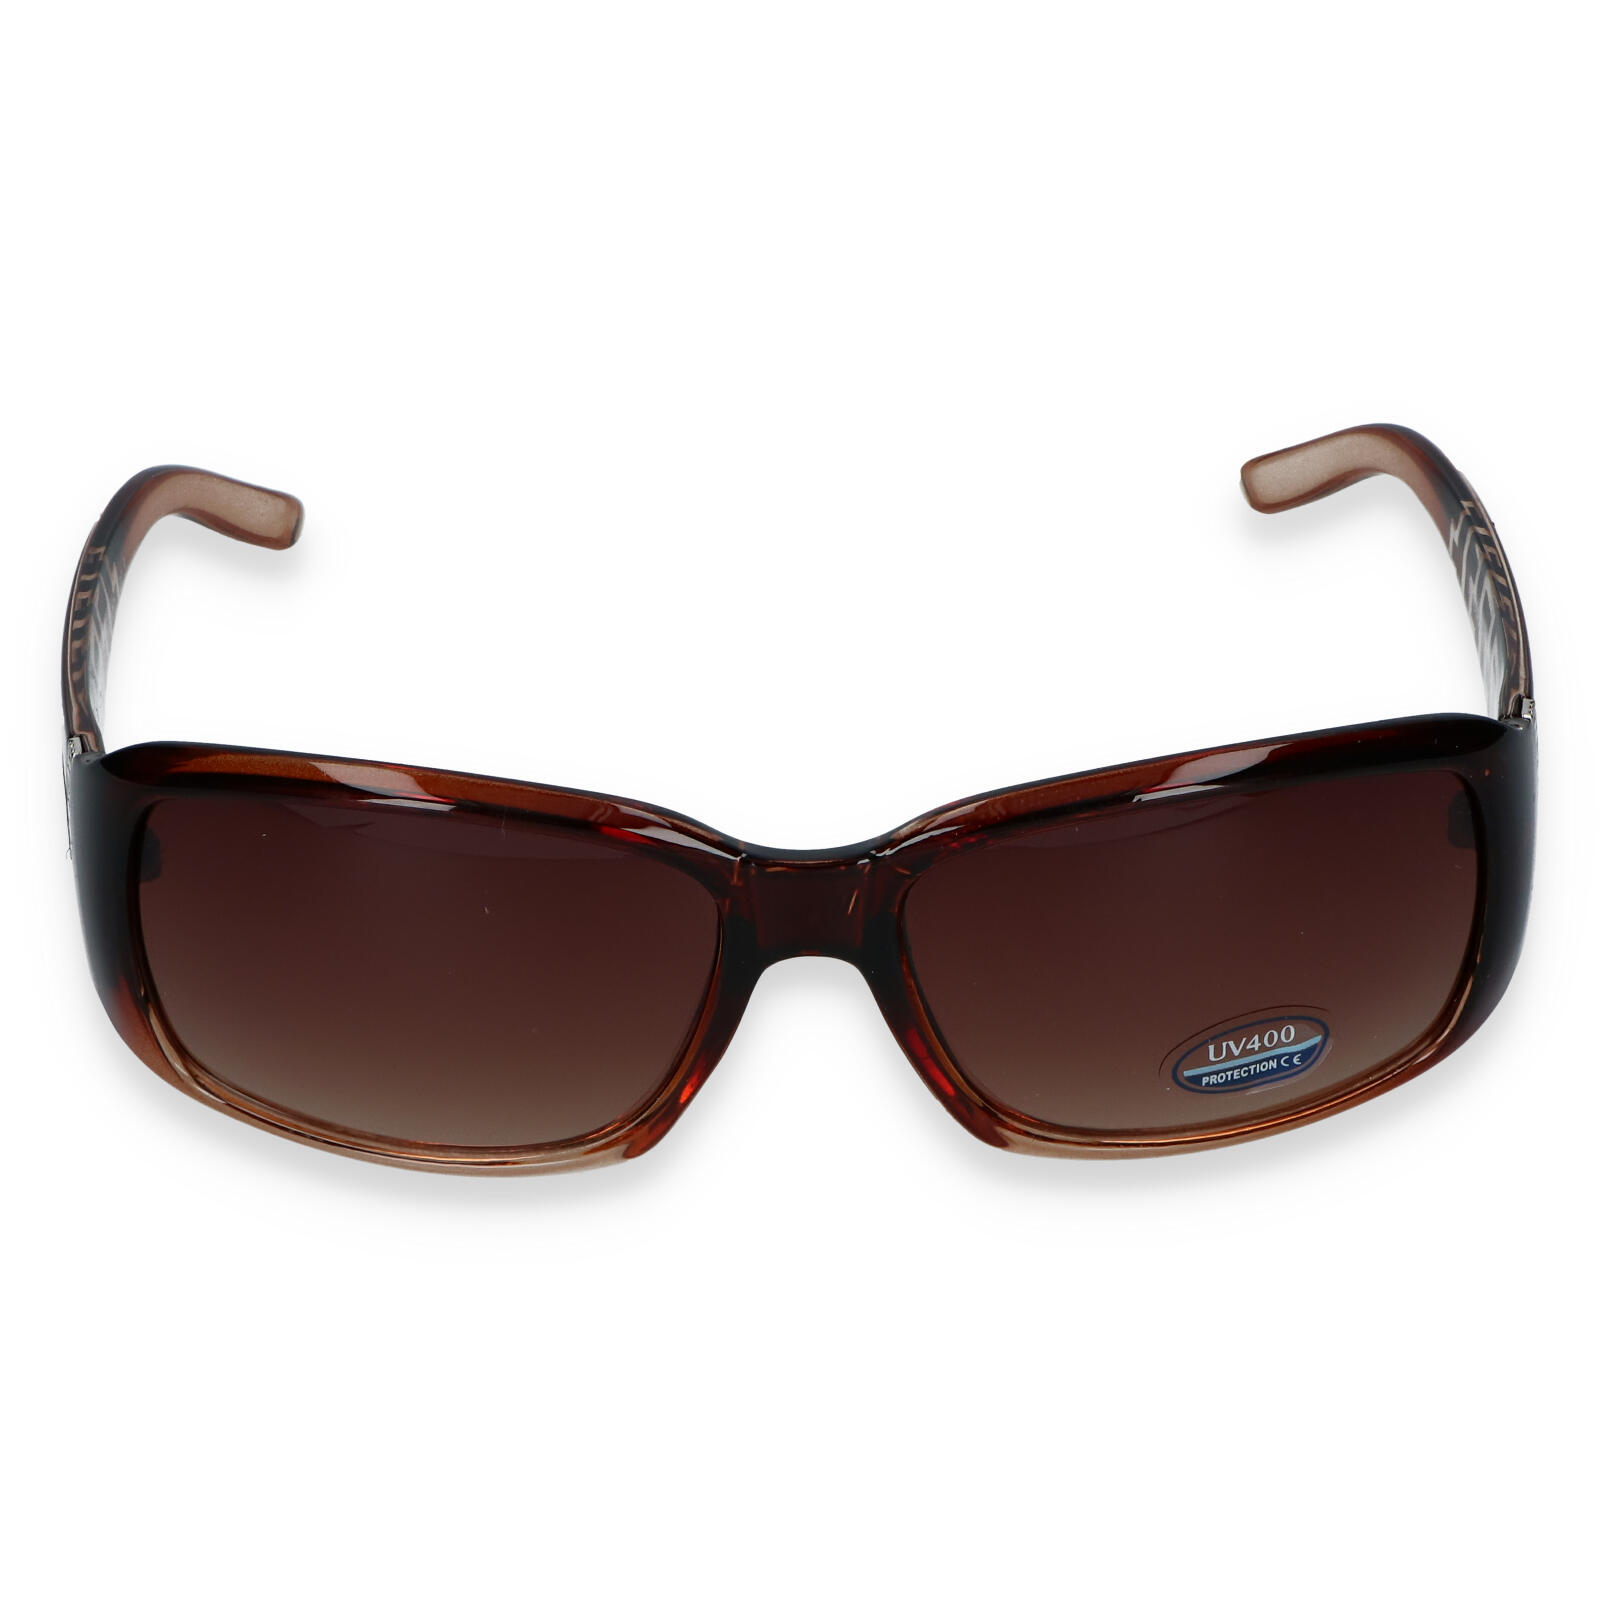 Dámske slnečné okuliare hnedé - SM08